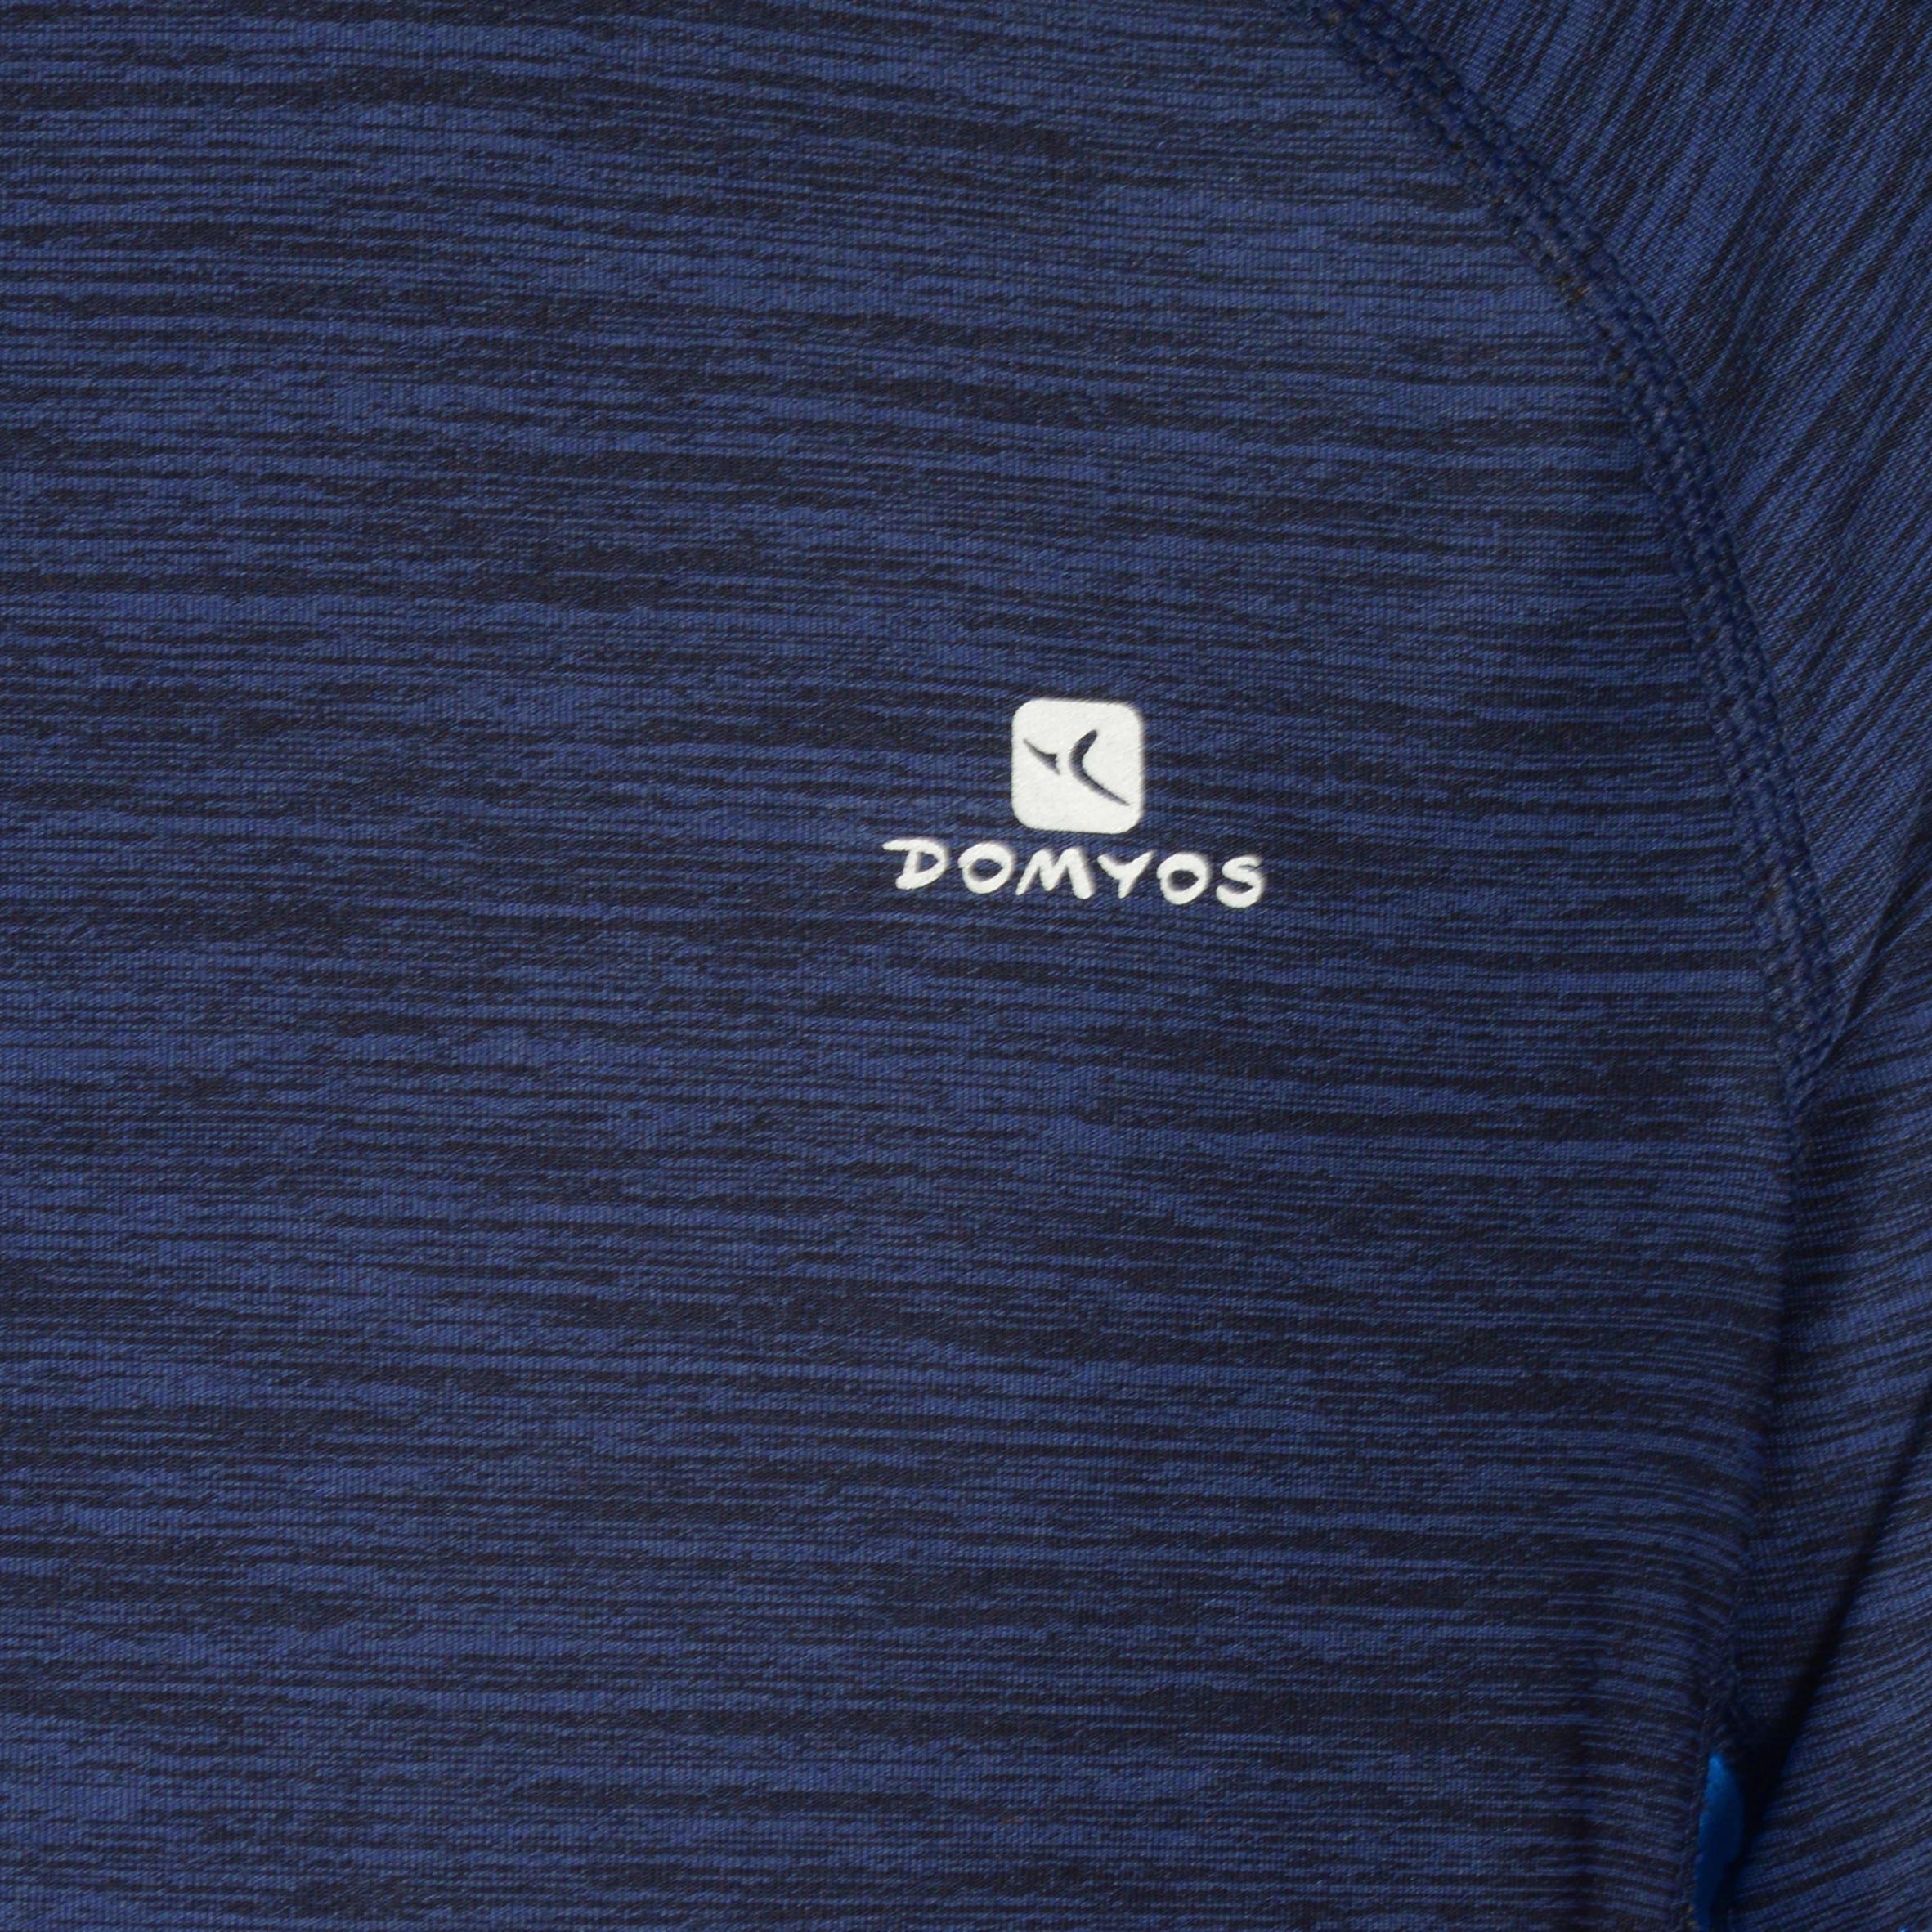 960 Boys' Short Sleeve Gym T-Shirt - Navy